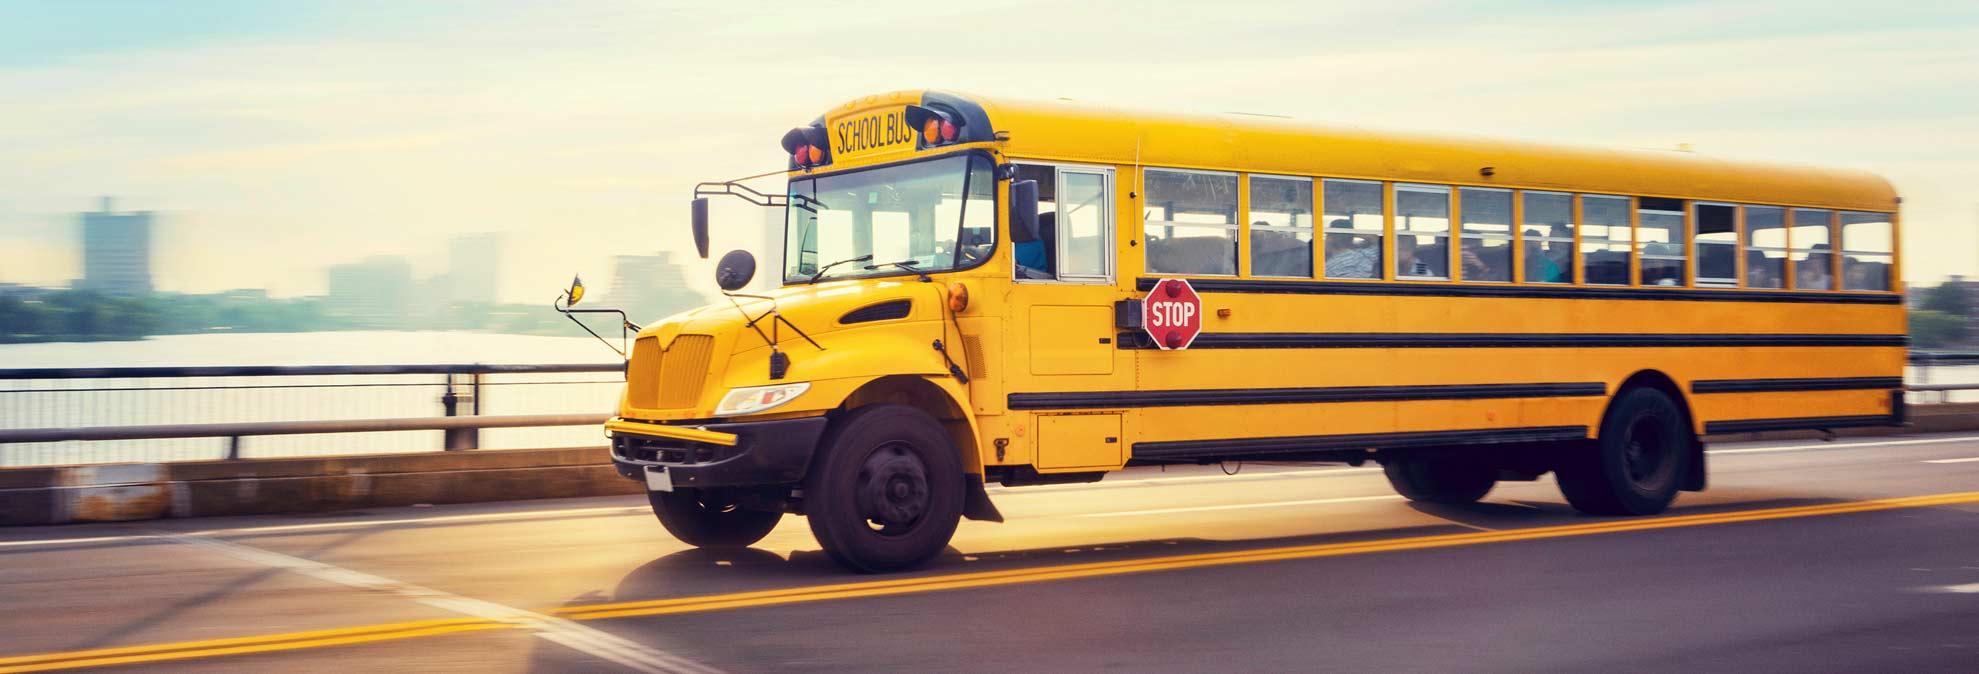 Best Used Car Sedans For High School Kids